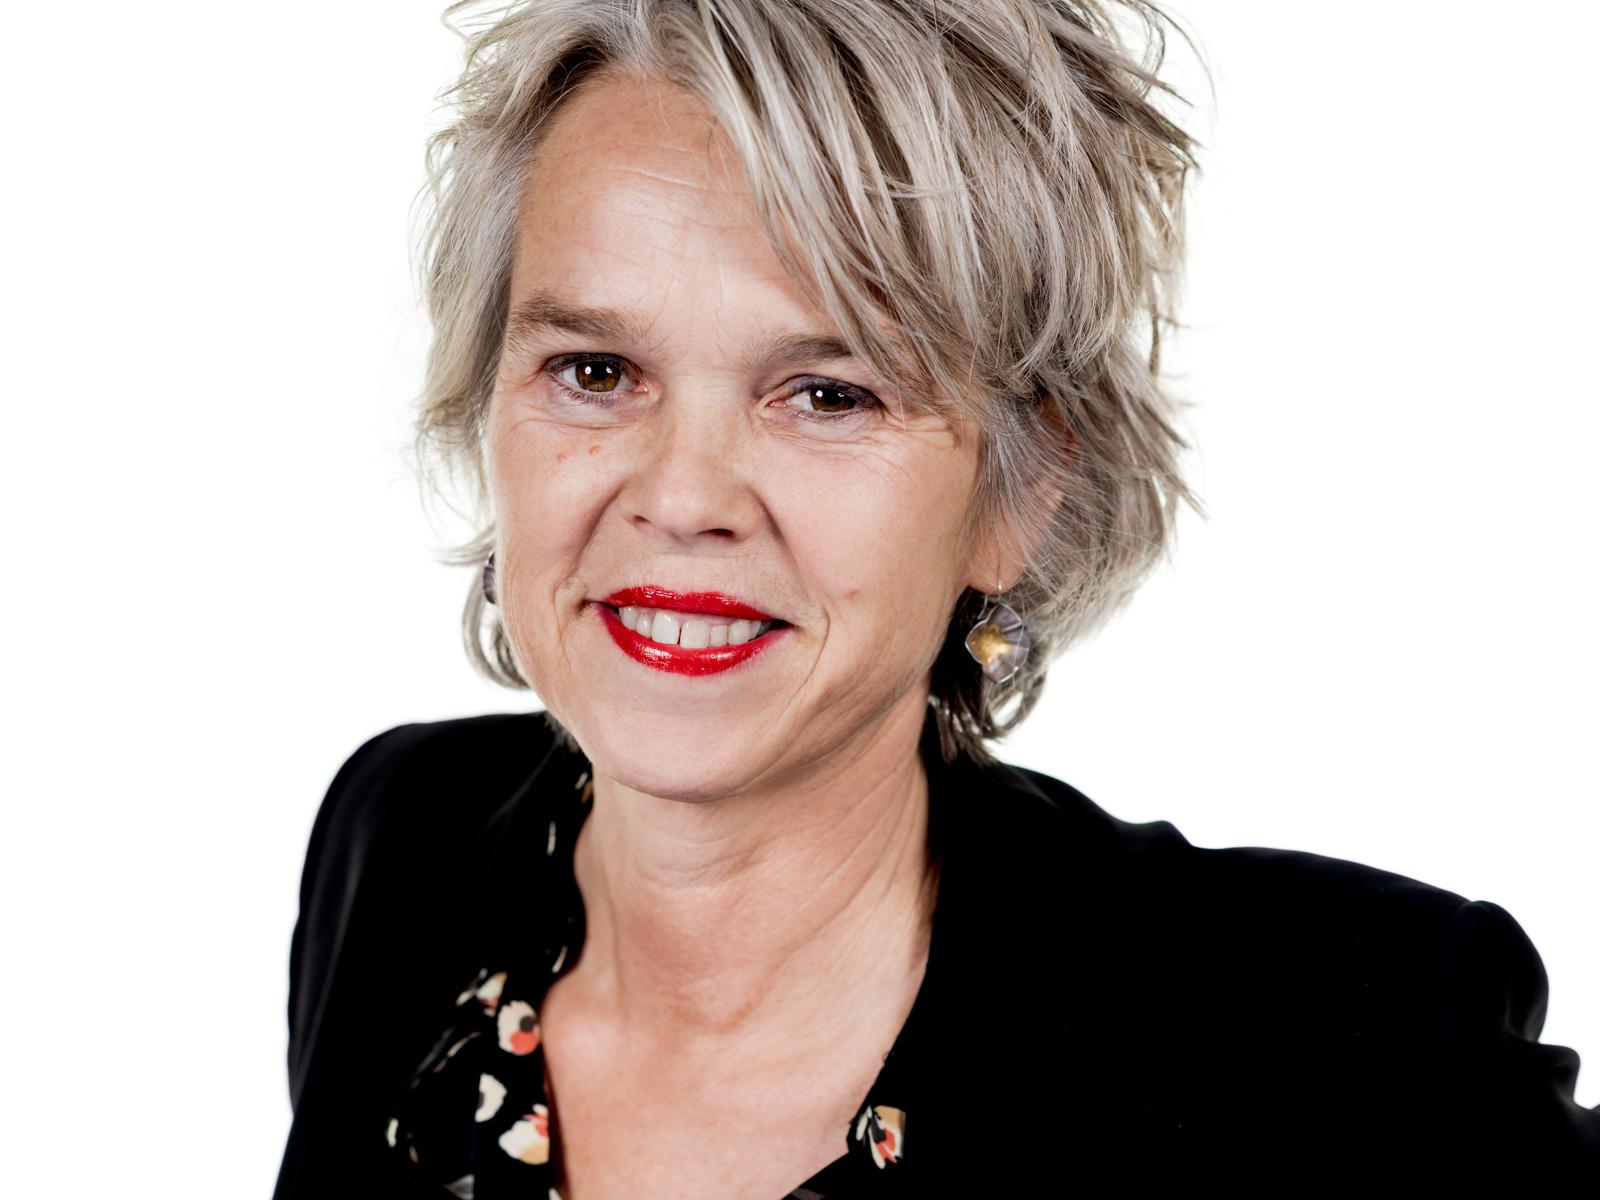 Zakelijke portret profielfoto linkedIn fotografie Zalmiy Paeez Fotografie Noord-Holland Haarlem Heemstede